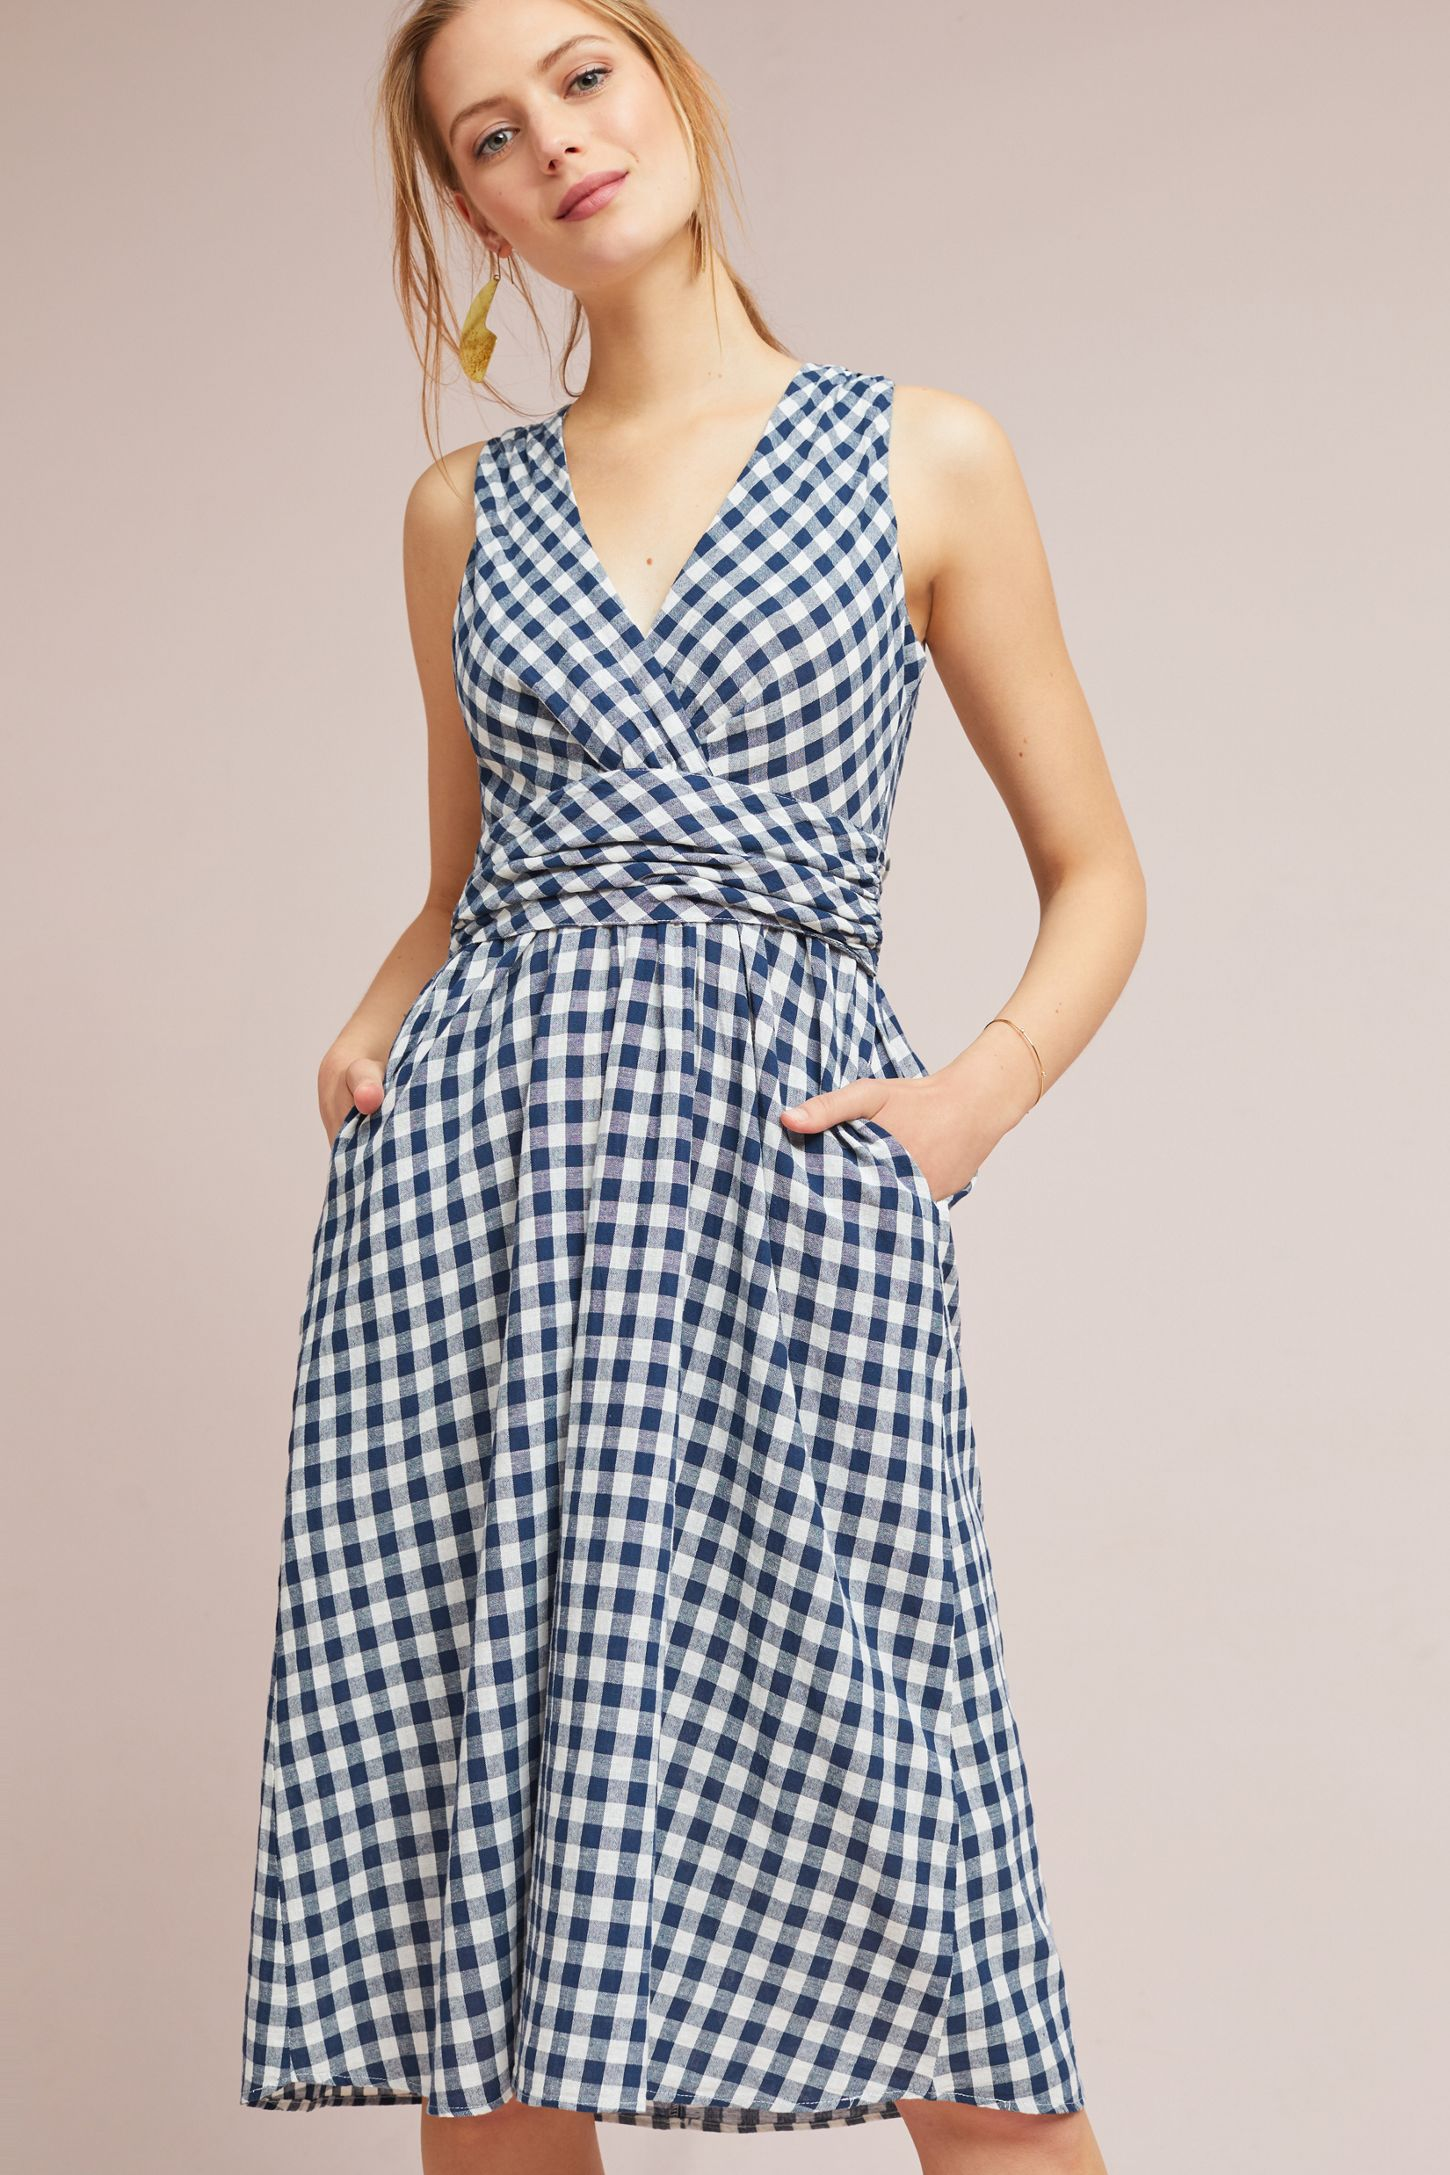 80b855306878 Grecca Gingham Midi Dress